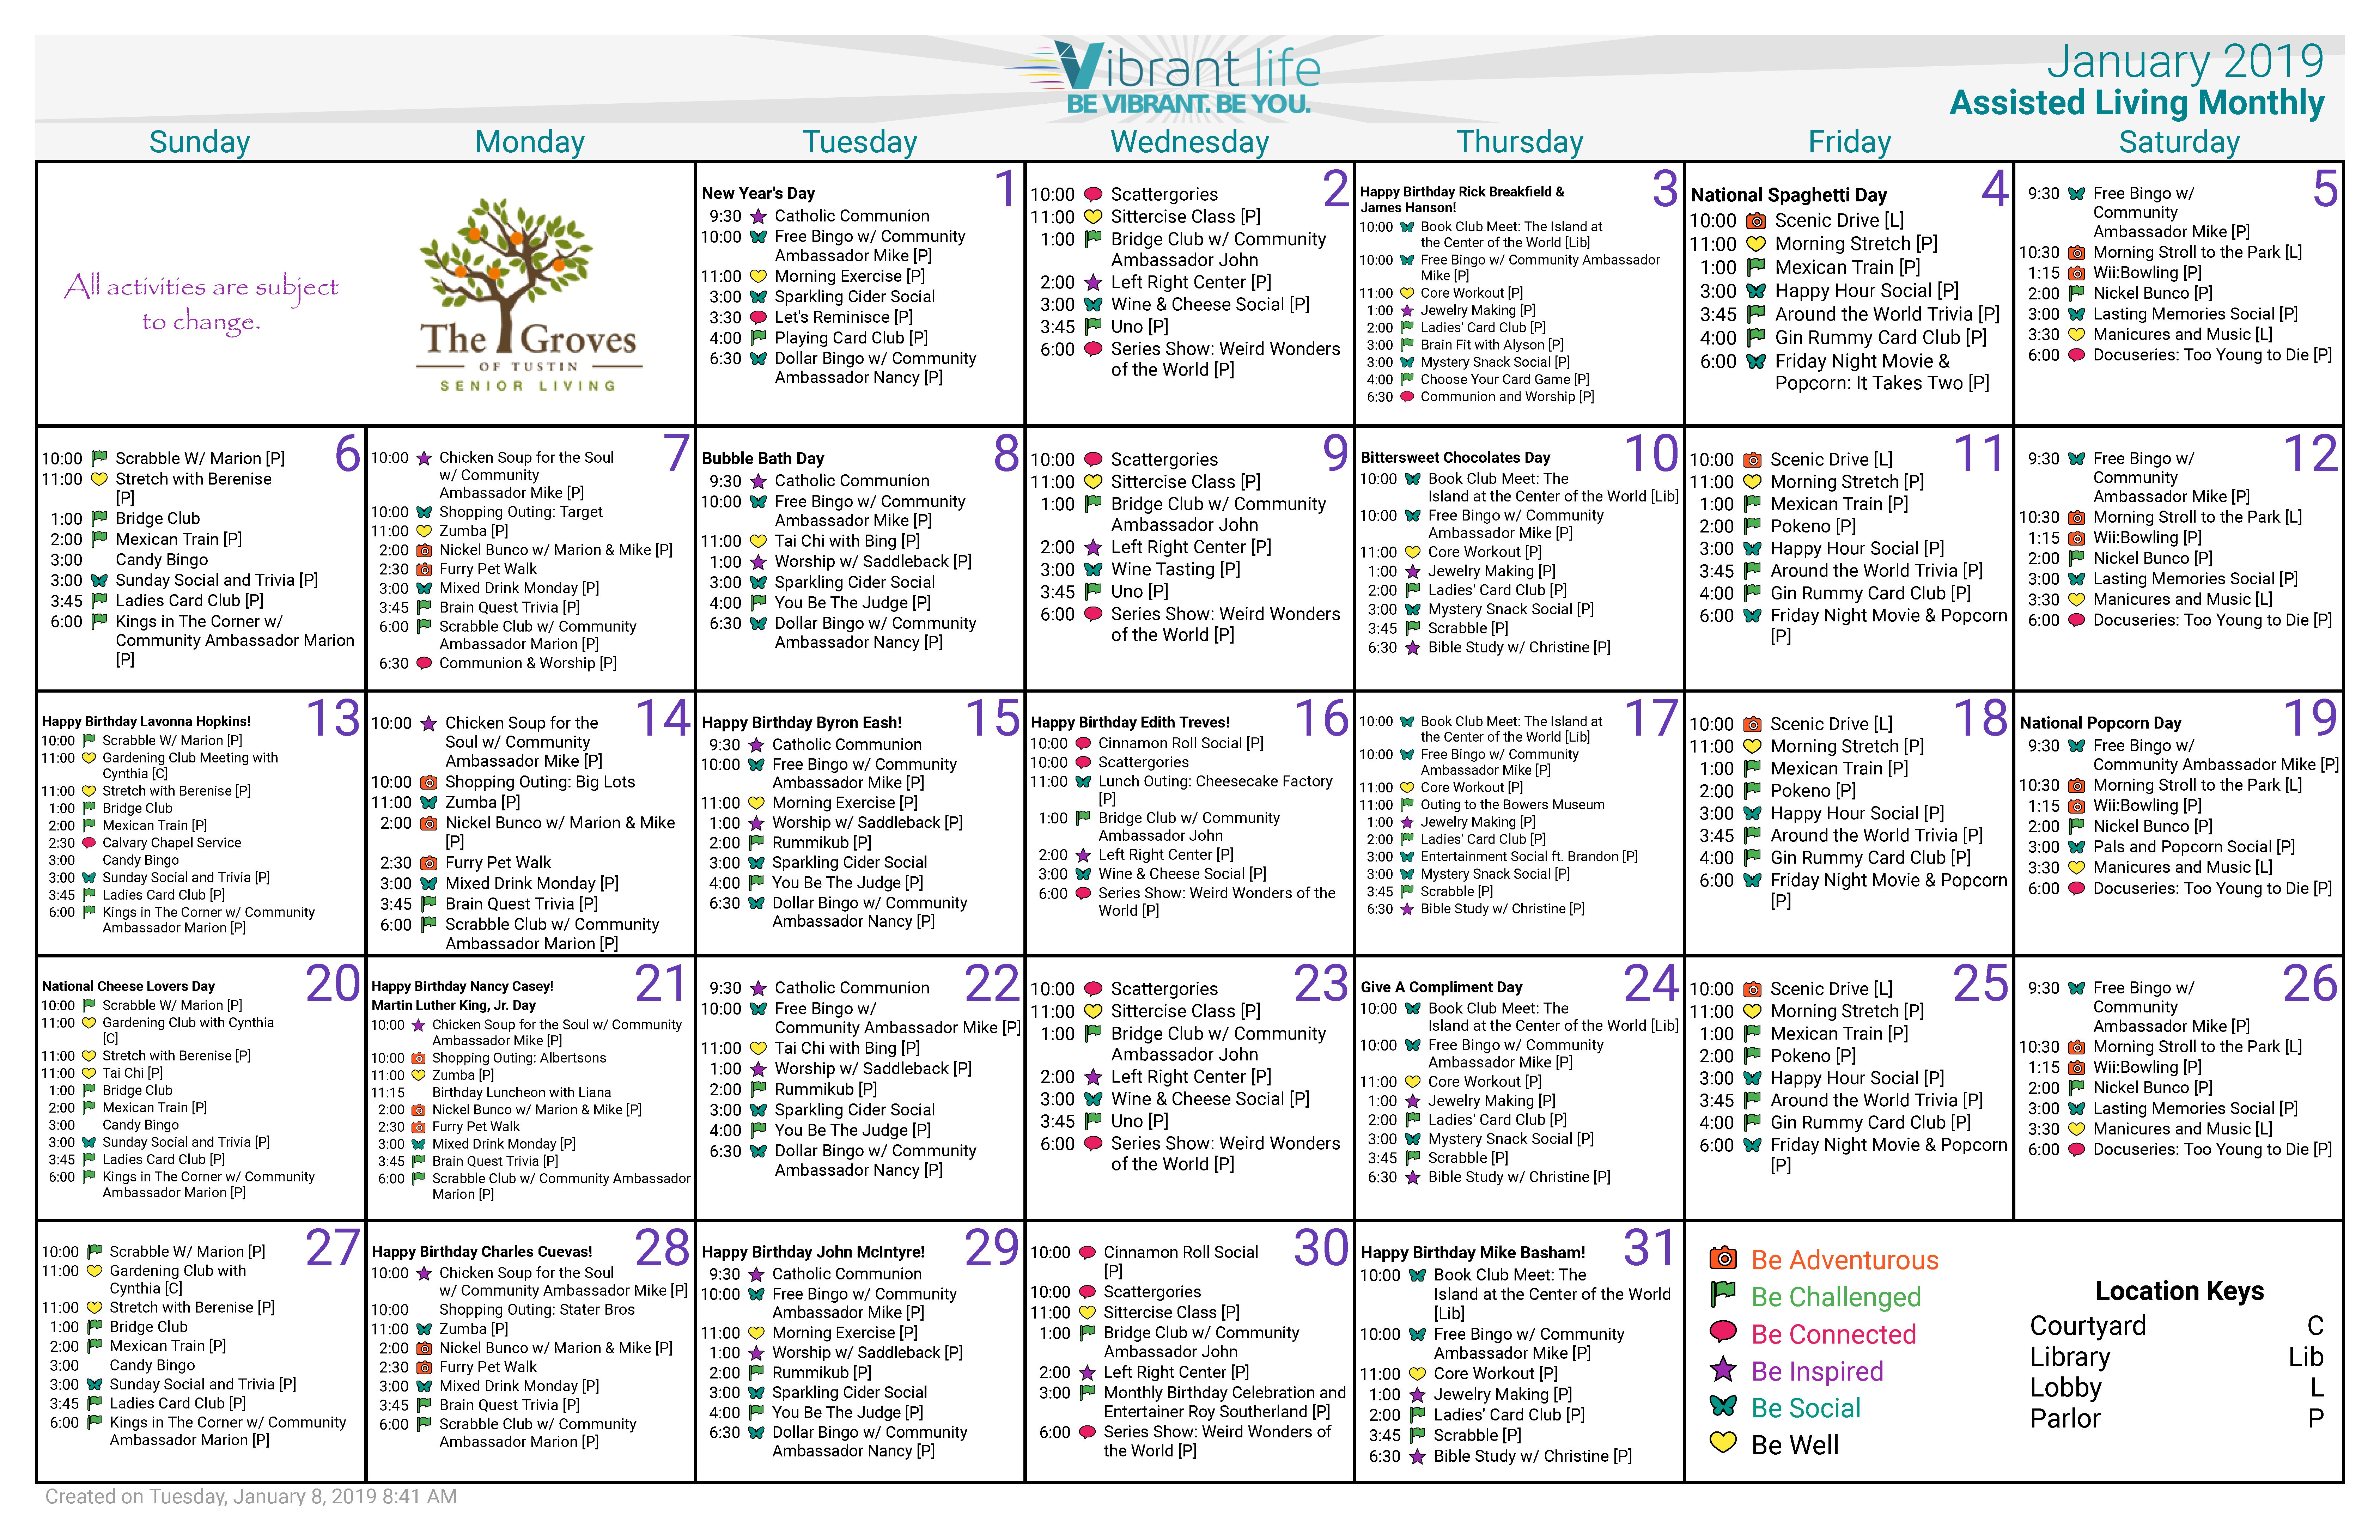 January 2019 Calendar Al – Groves Of Tustin Calendar 2019 Target